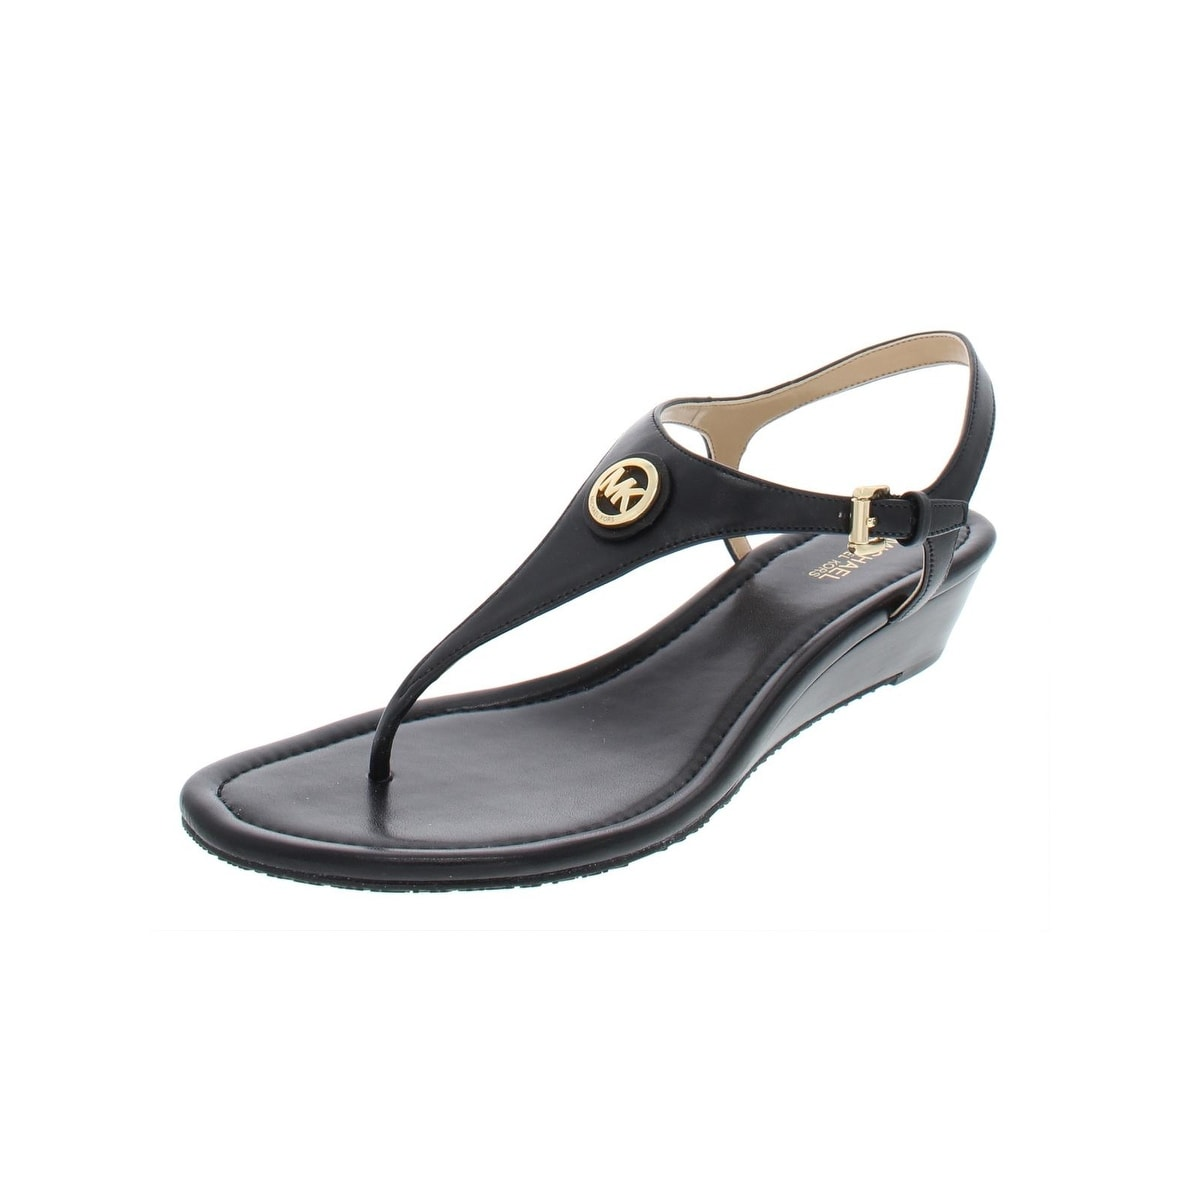 22df09cc5a56 Shop MICHAEL Michael Kors Womens Ramona Wedge Sandals Leather Thong ...